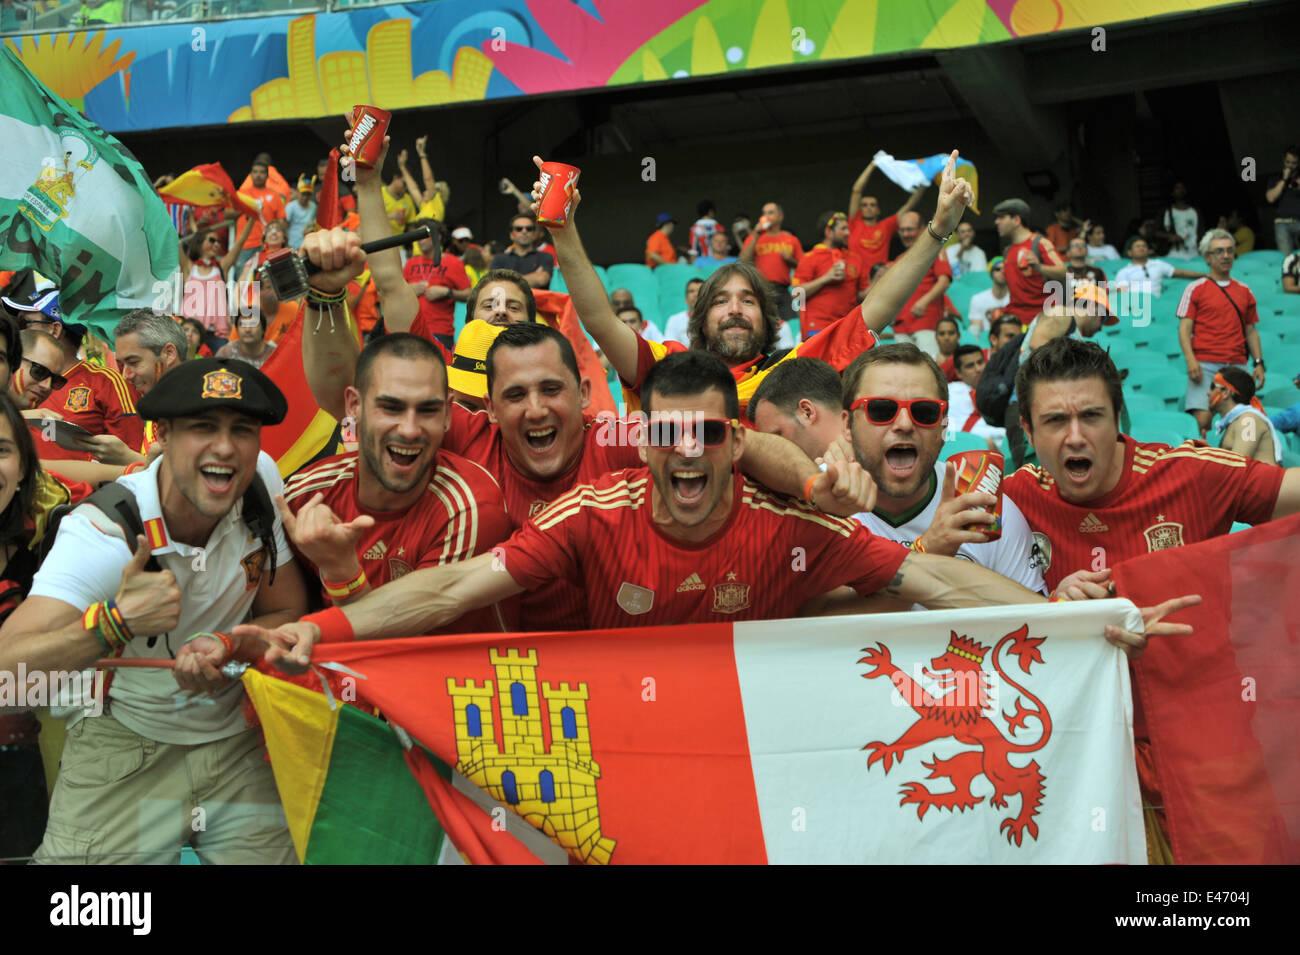 WM 2014, Salvador da Bahia, Holland vs. Spanien, Spanische Fans vor dem Spiel. Editorial use only. Stock Photo